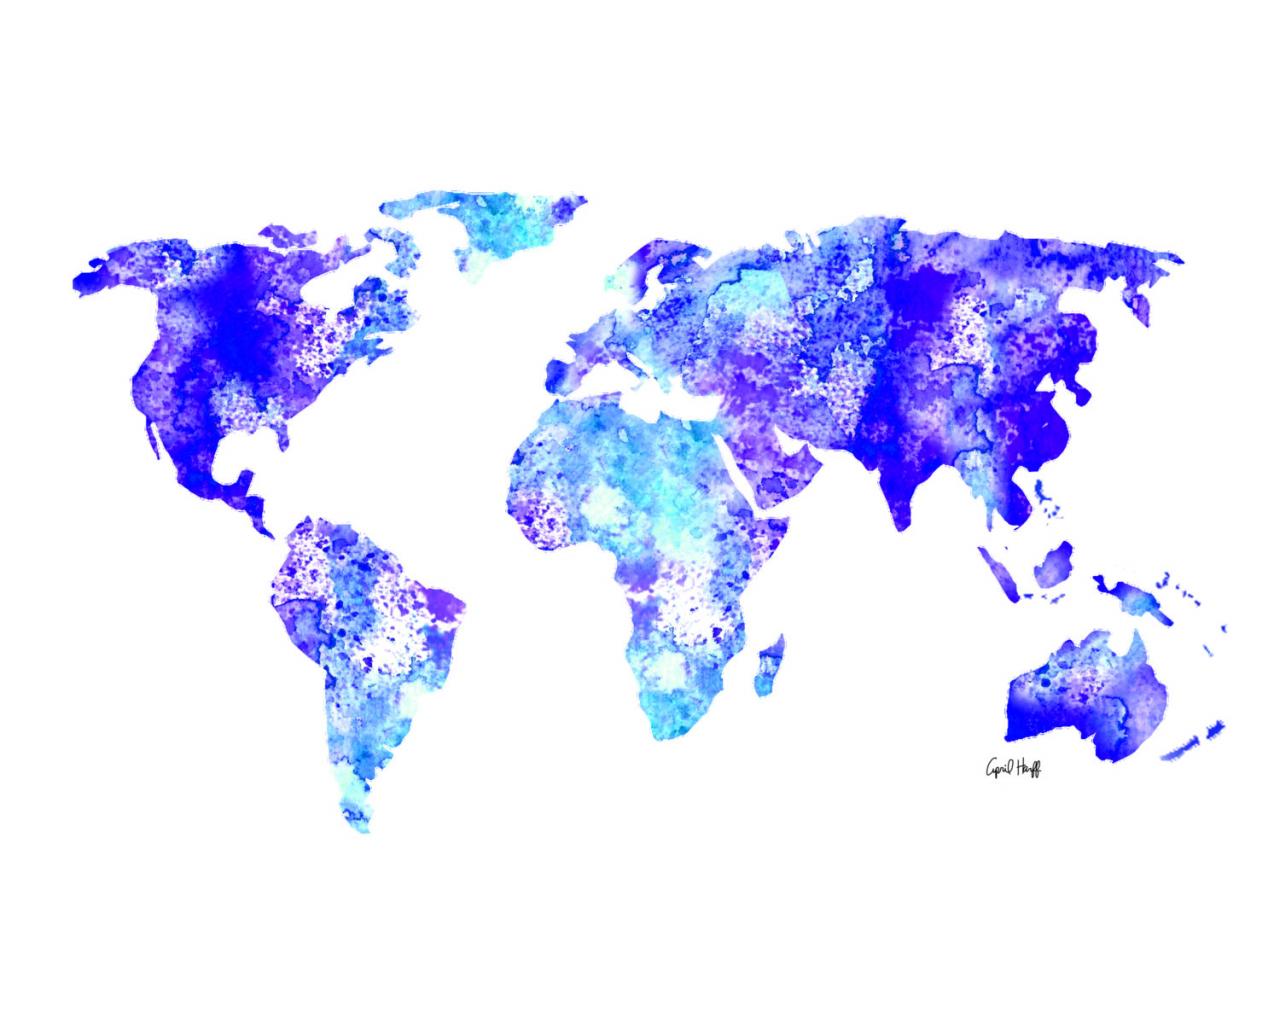 Free Download Watercolor World Map Print Wall Art Painting